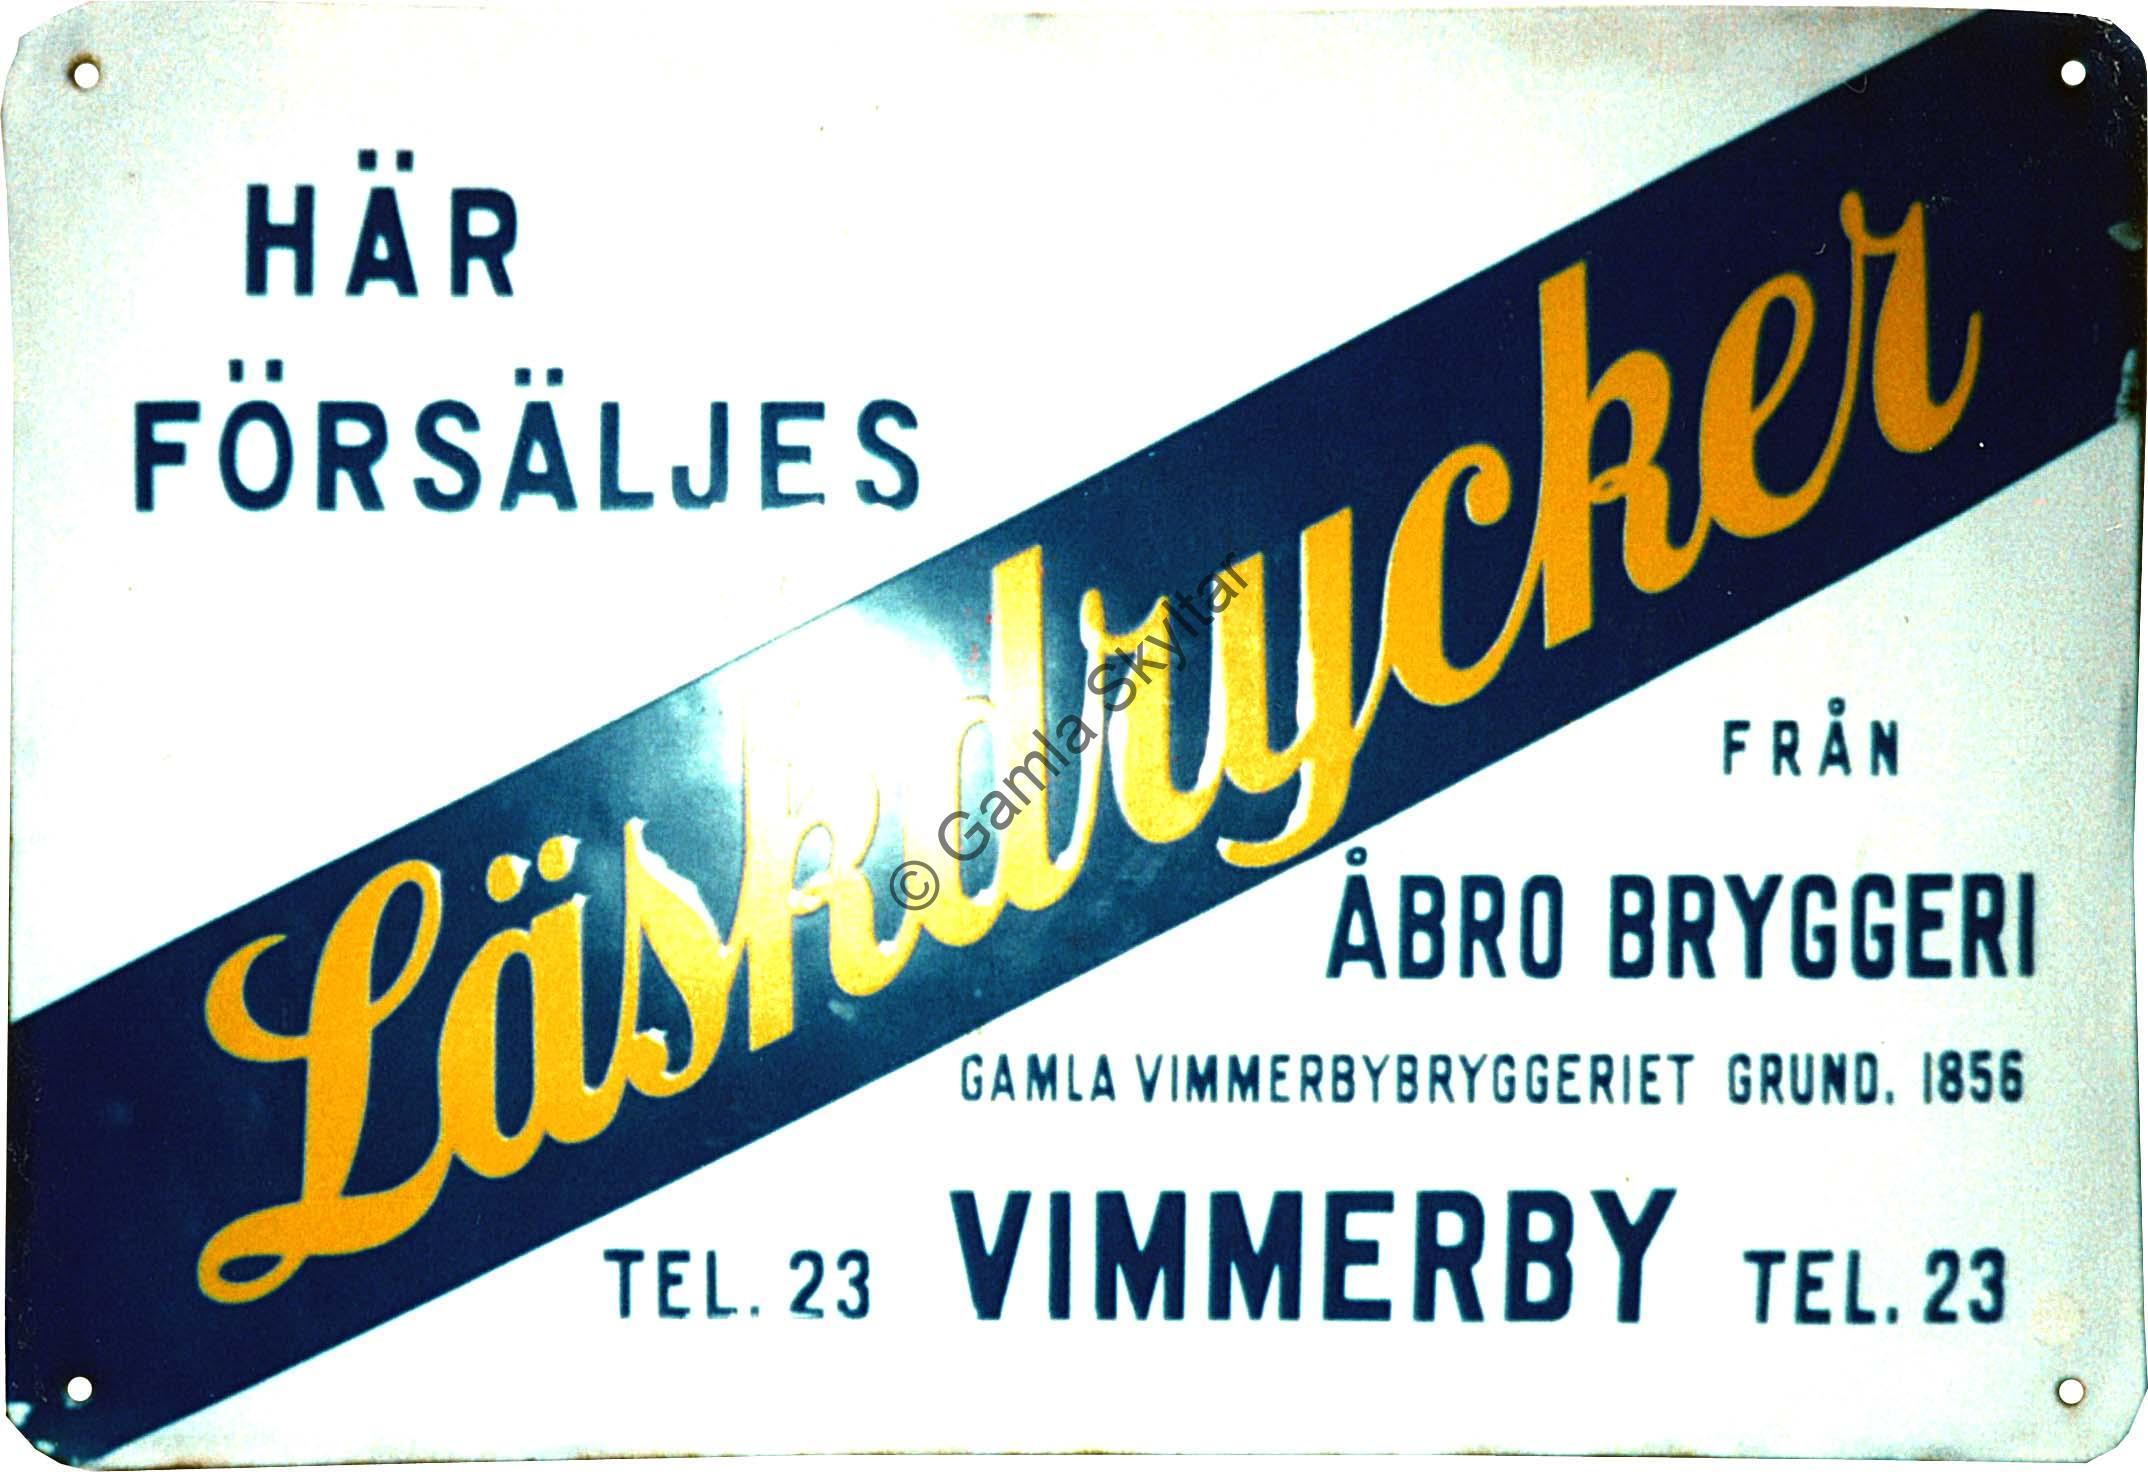 Åbro Bryggeri Läskedrycker - Gamla Skyltar 08c0775175f62